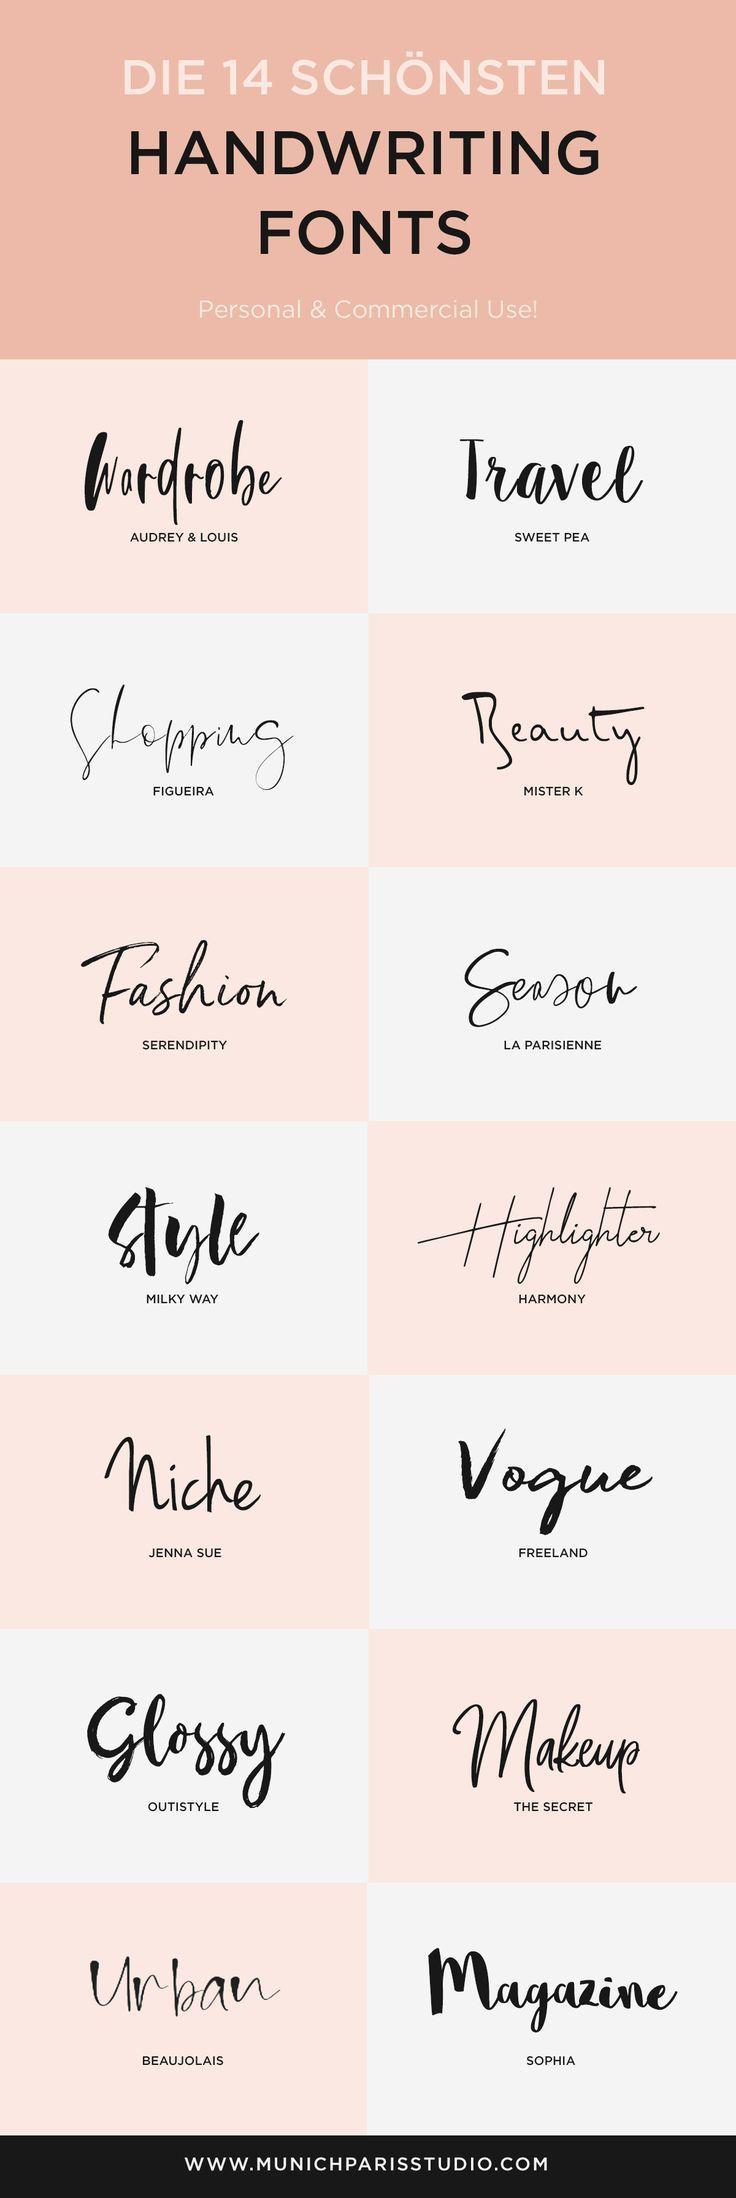 Photo of The 14 most beautiful manuscript fonts to download MunichPa …